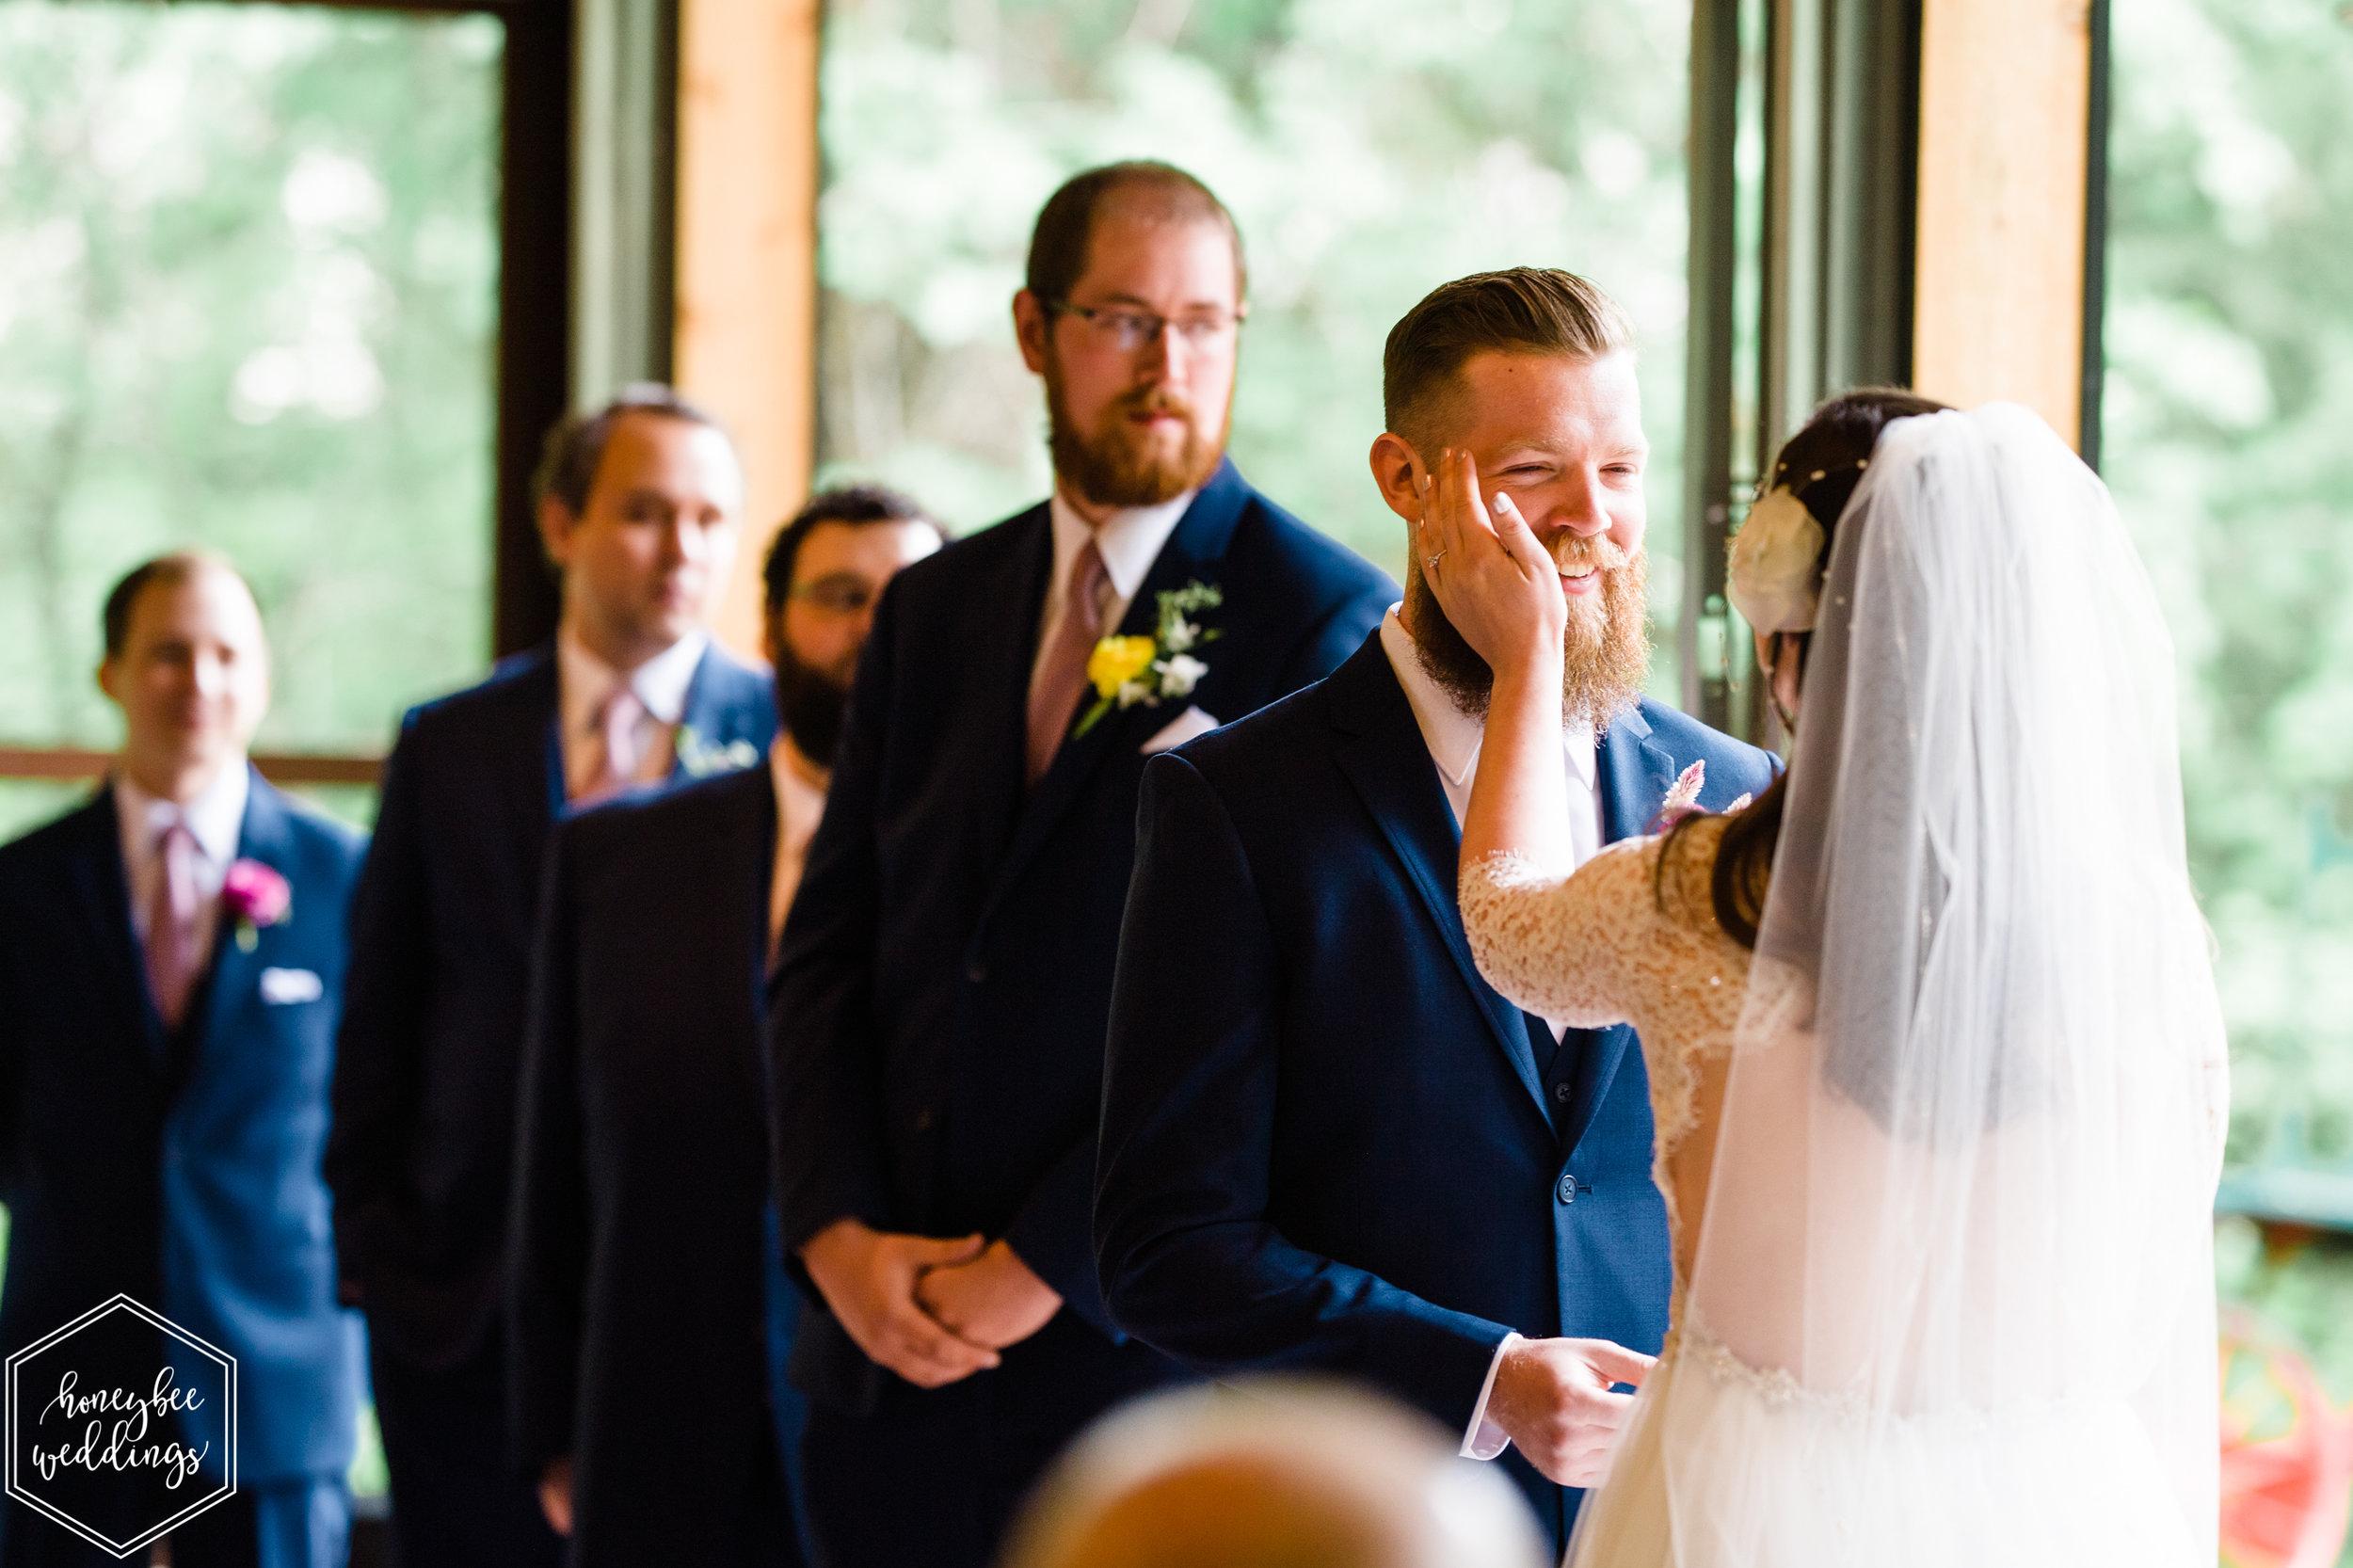 054Glacier National Park Wedding_Izaak Walton Inn Wedding_Honeybee Weddings_Norah & Kyle_June 08, 2019-2175.jpg